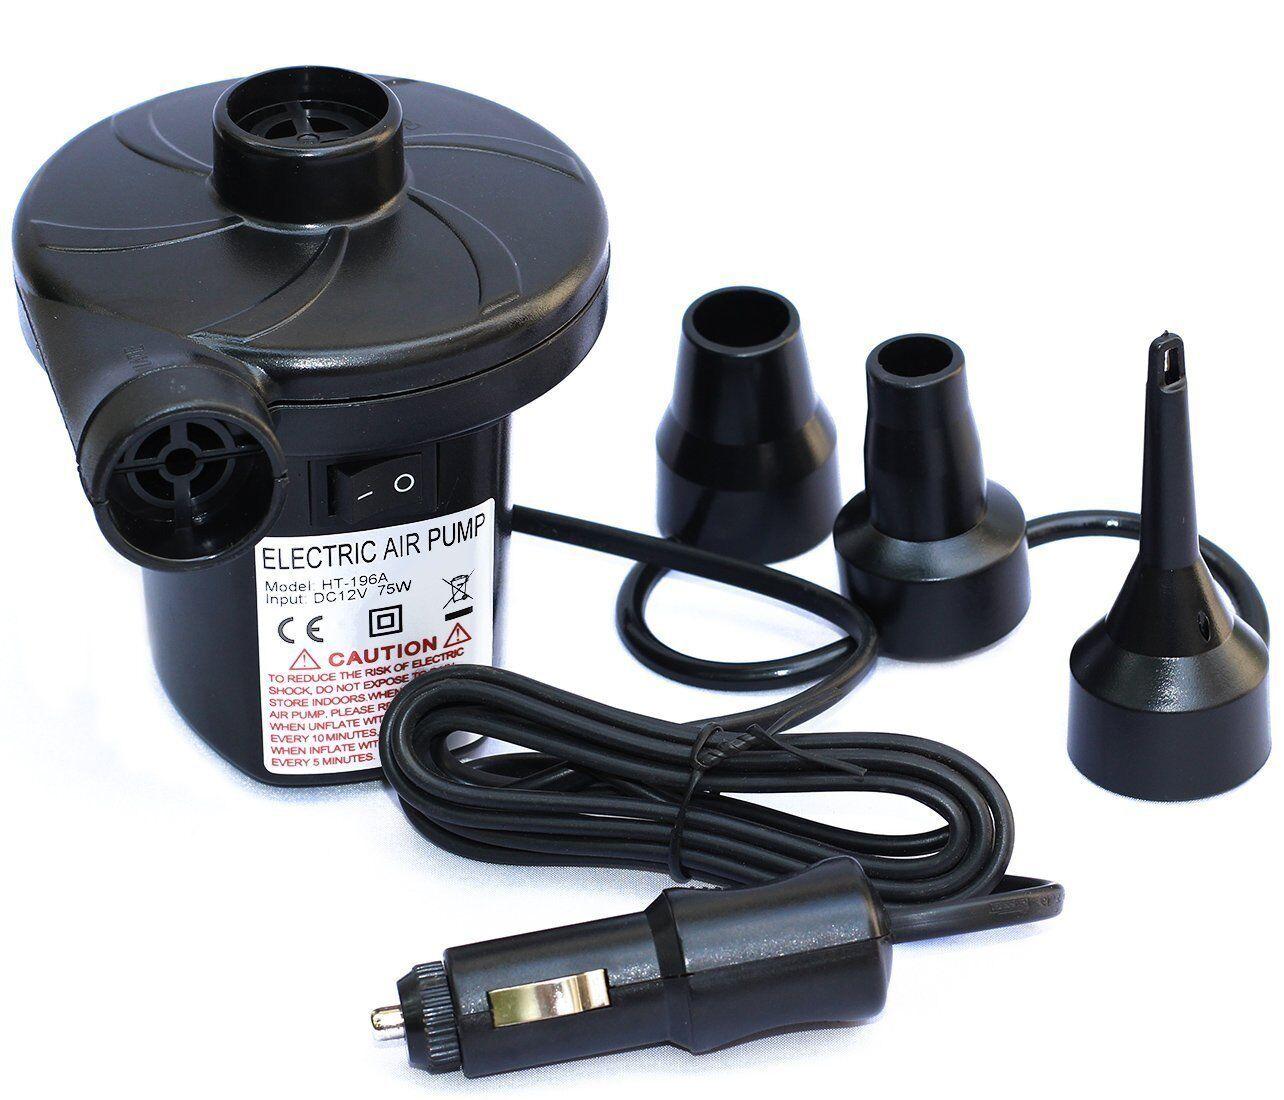 12V DC Electric Air Pump for Inflatables & Mattress